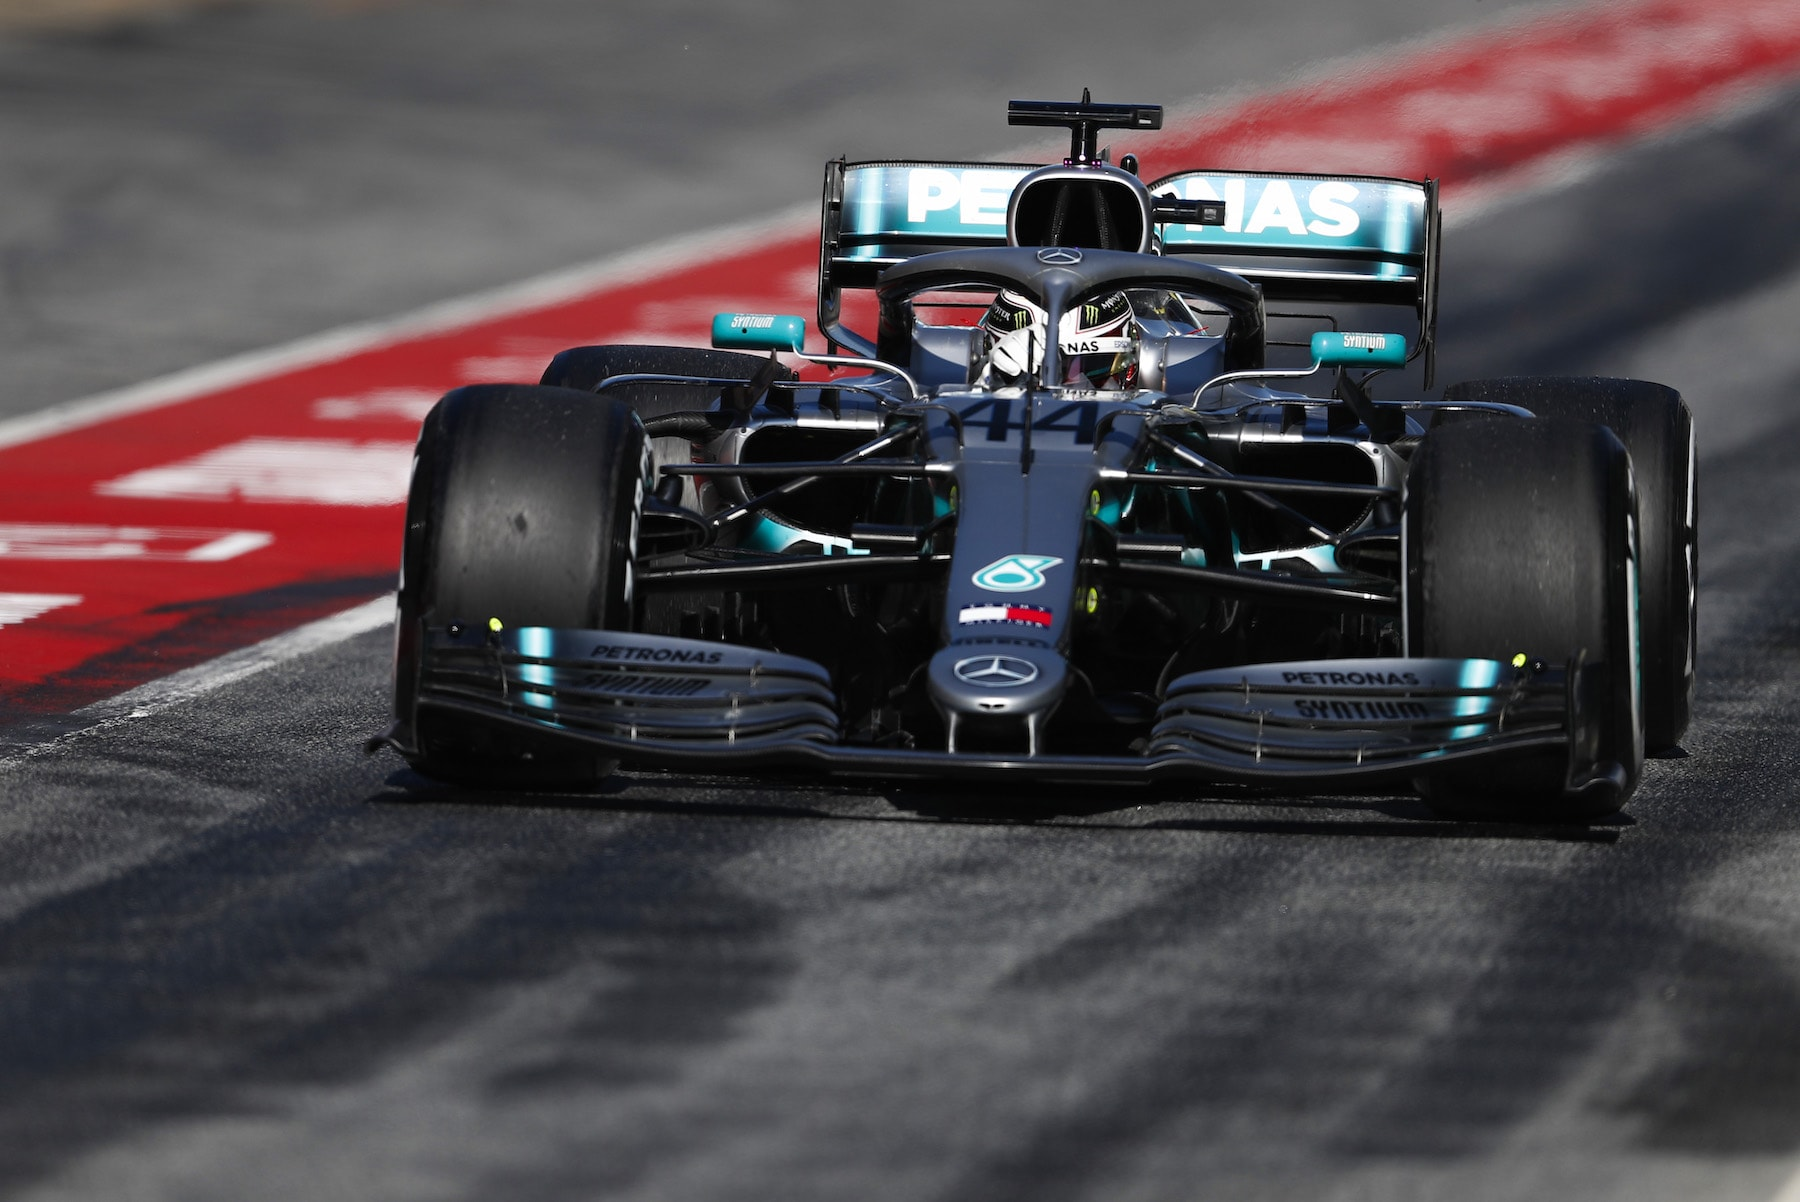 2019 Lewis Hamilton | Mercedes W10 | 2019 Barcelona T2 D4 1.jpg